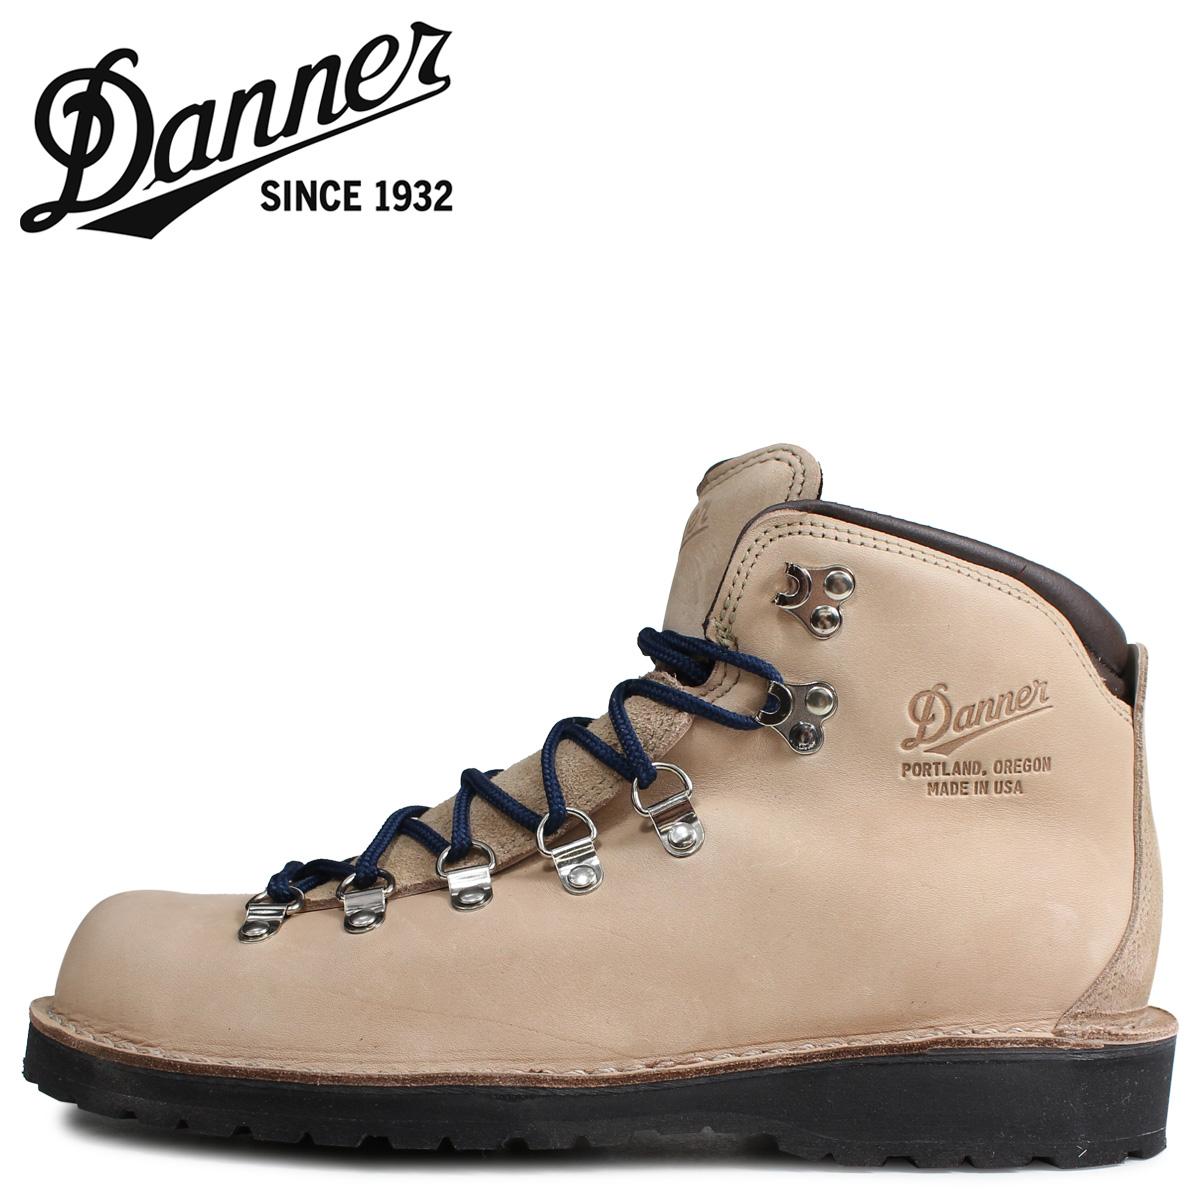 Danner ダナー マウンテンパス ブーツ メンズ MOUNTAIN PASS MADE IN USA EEワイズ ベージュ 33292